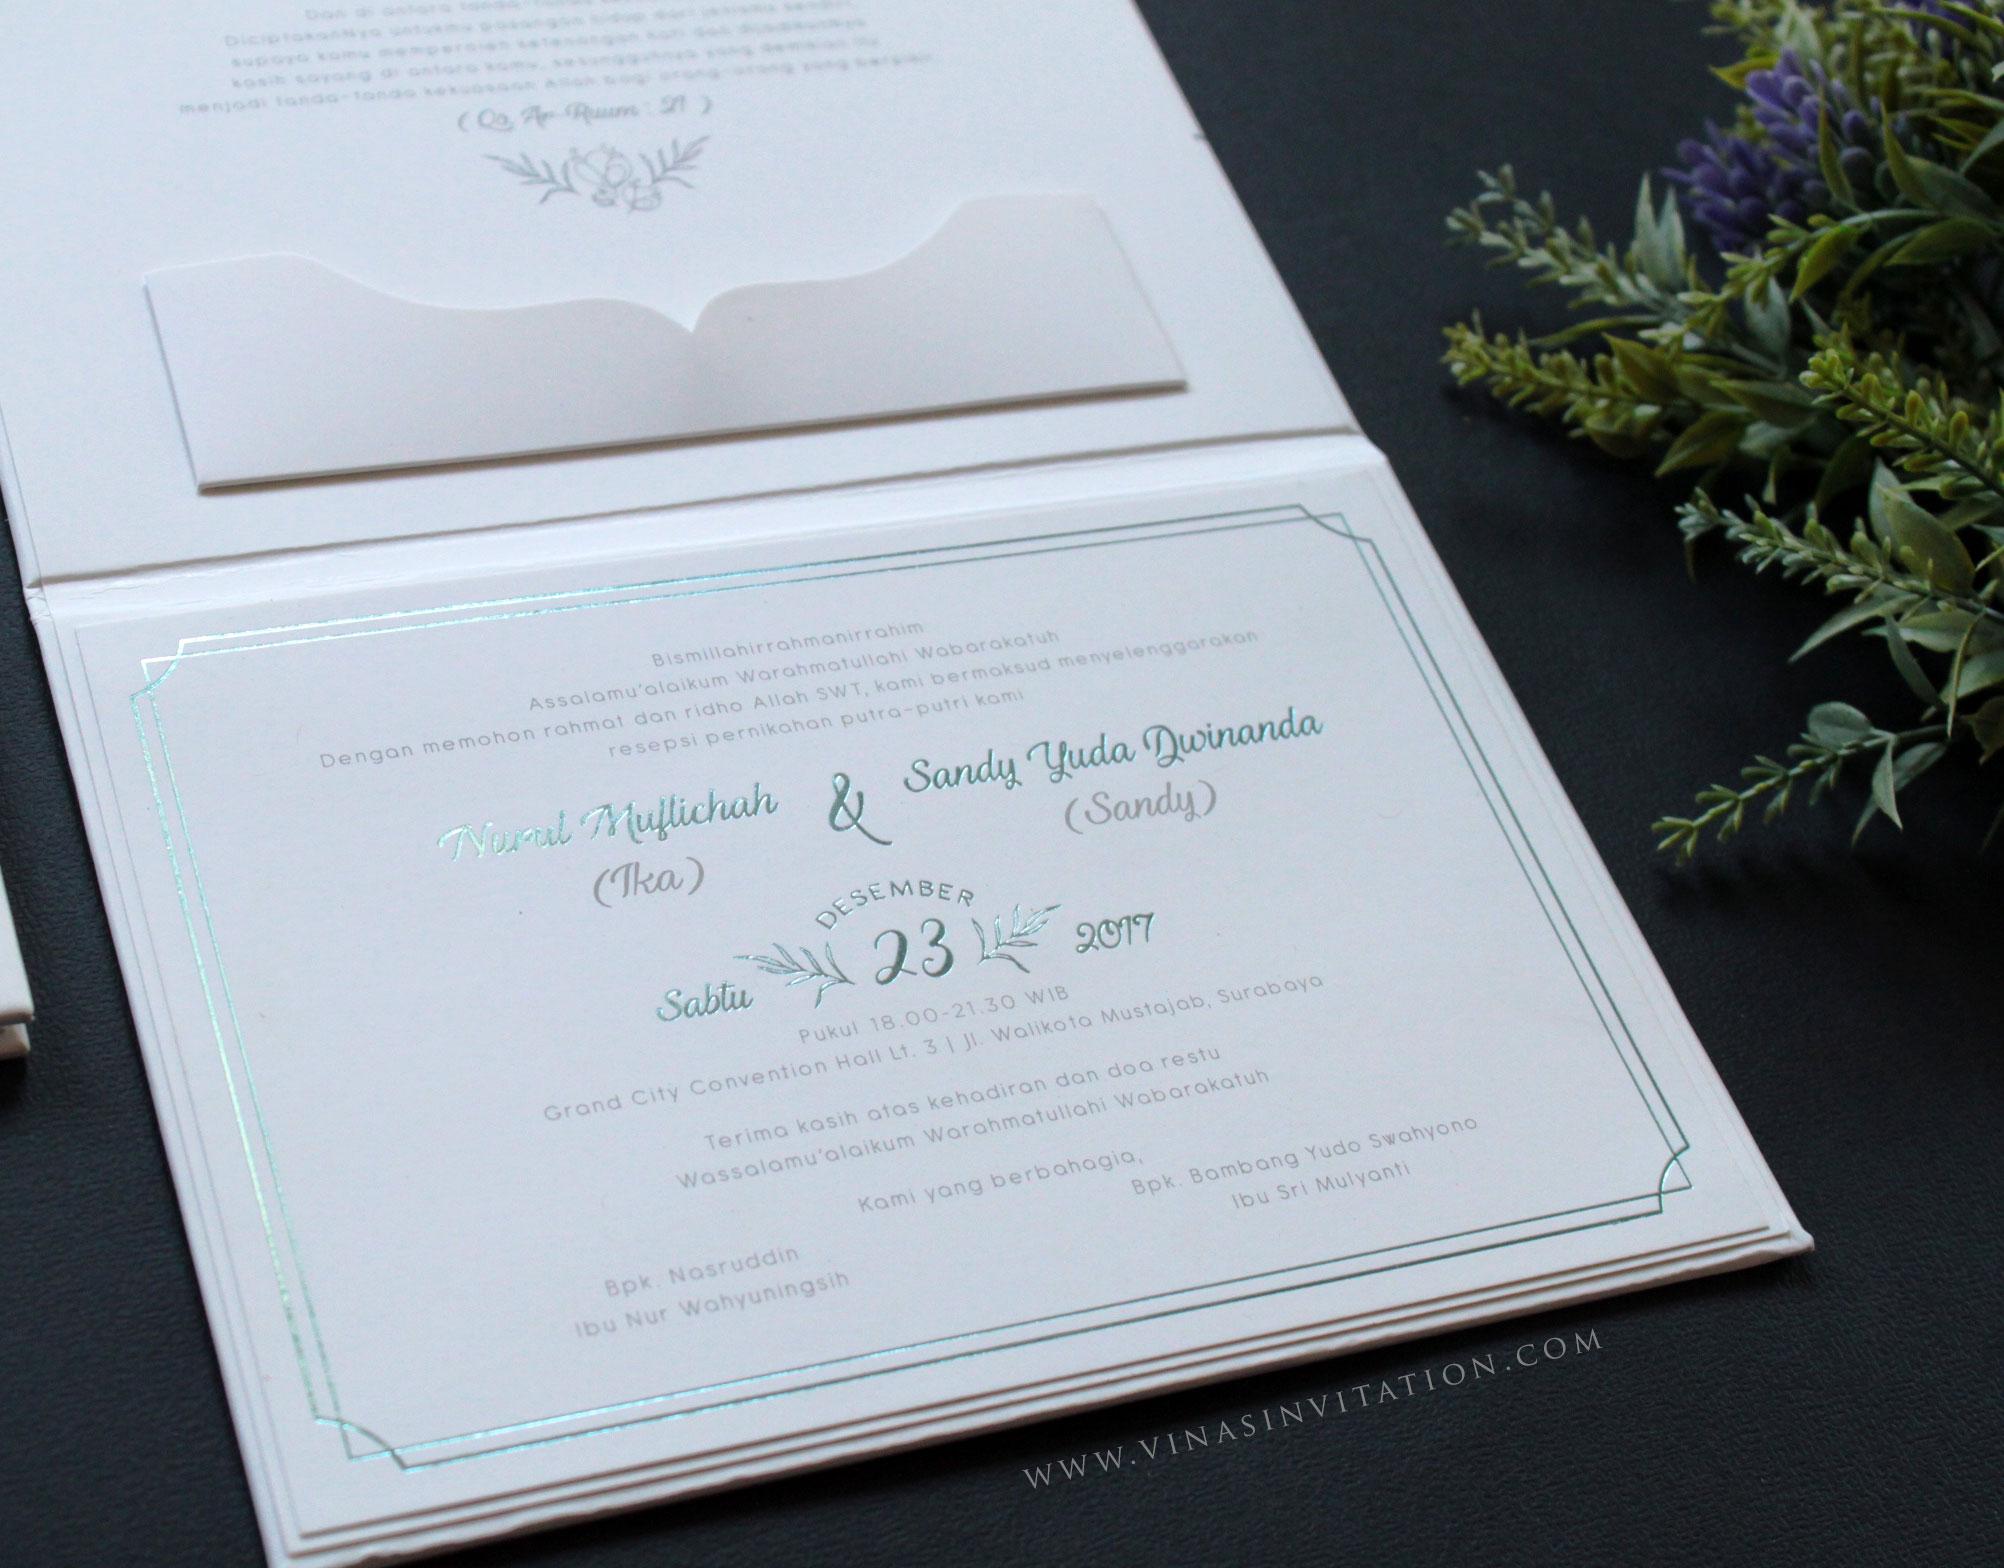 Vinas invitation wedding invitations in surabaya bridestory stopboris Gallery